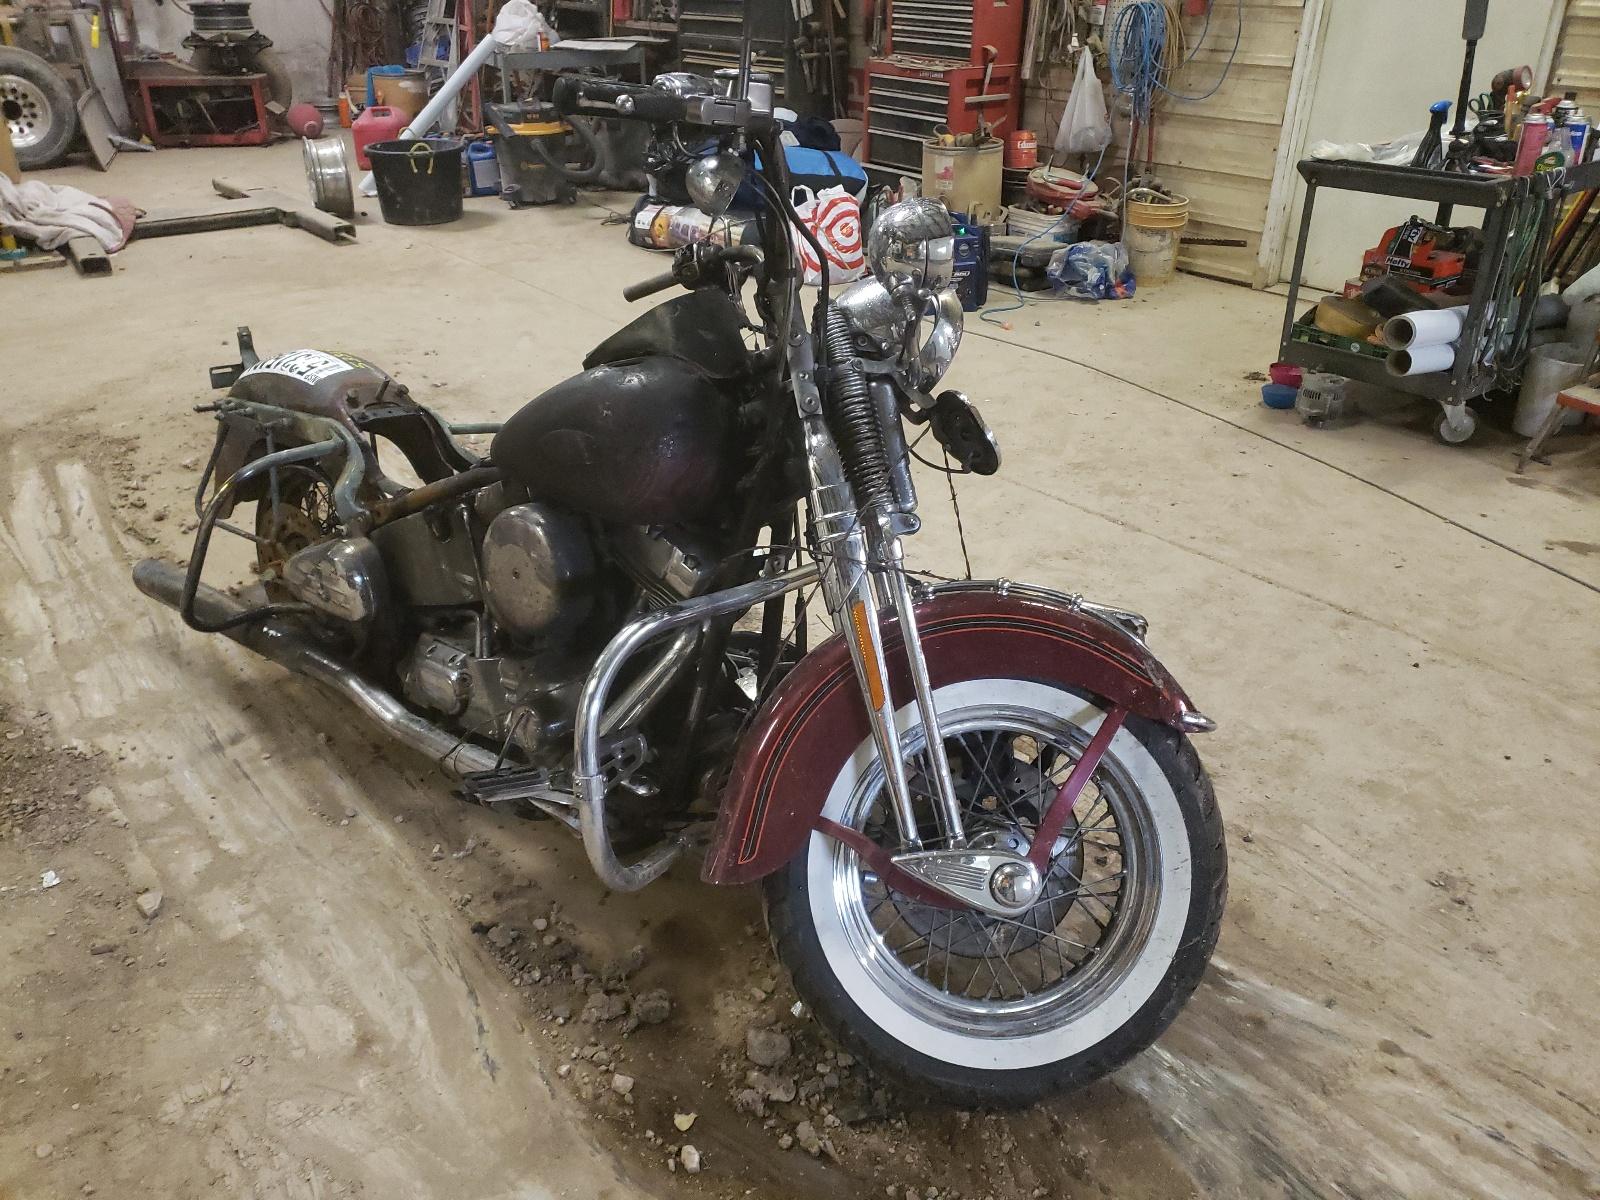 2000 Harley-Davidson Flsts